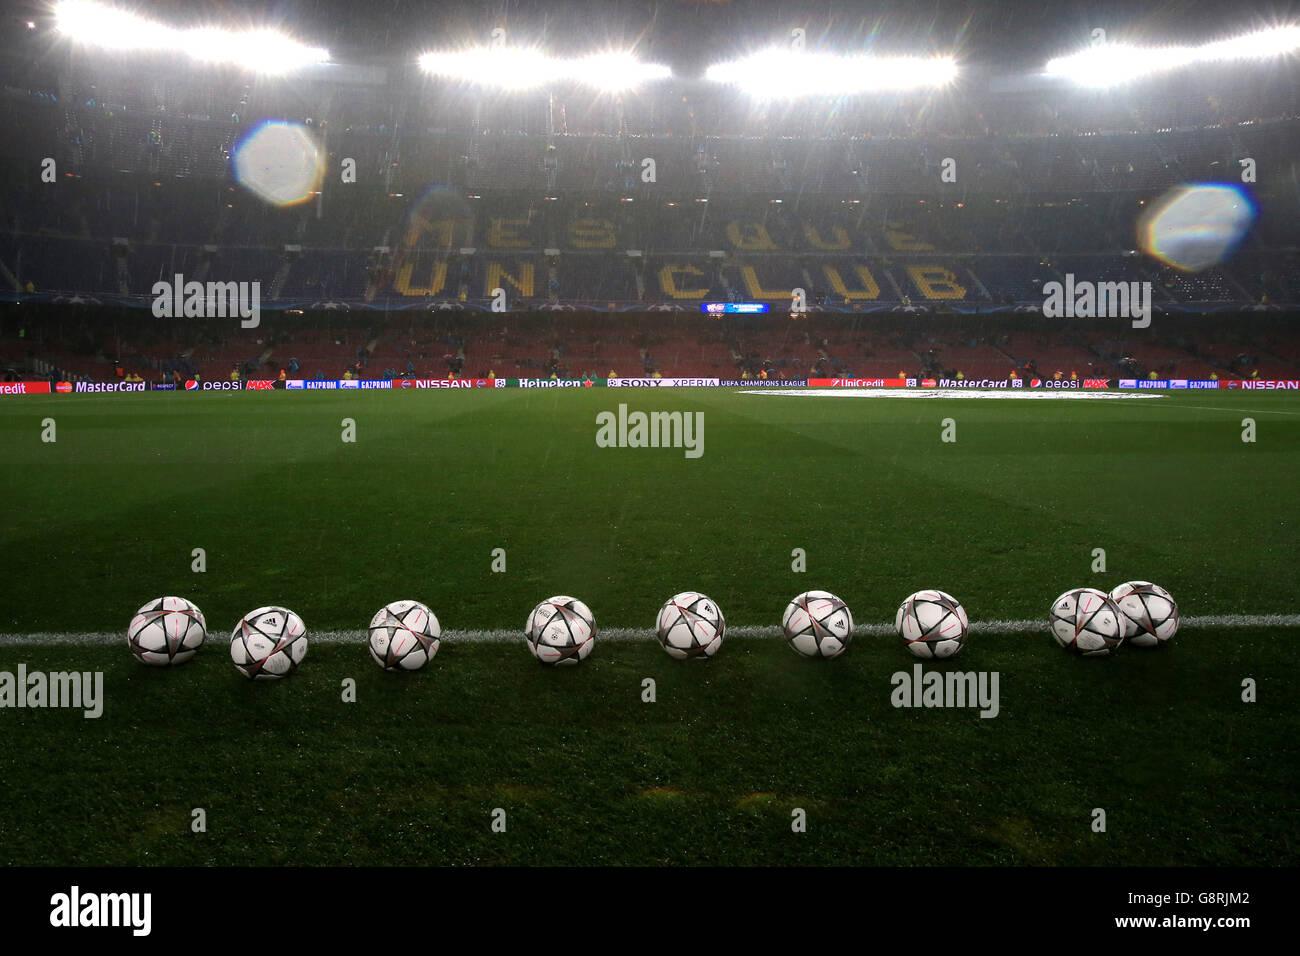 Barcelona v Arsenal - UEFA Champions League - Round of Sixteen - Second Leg - Camp Nou - Stock Image